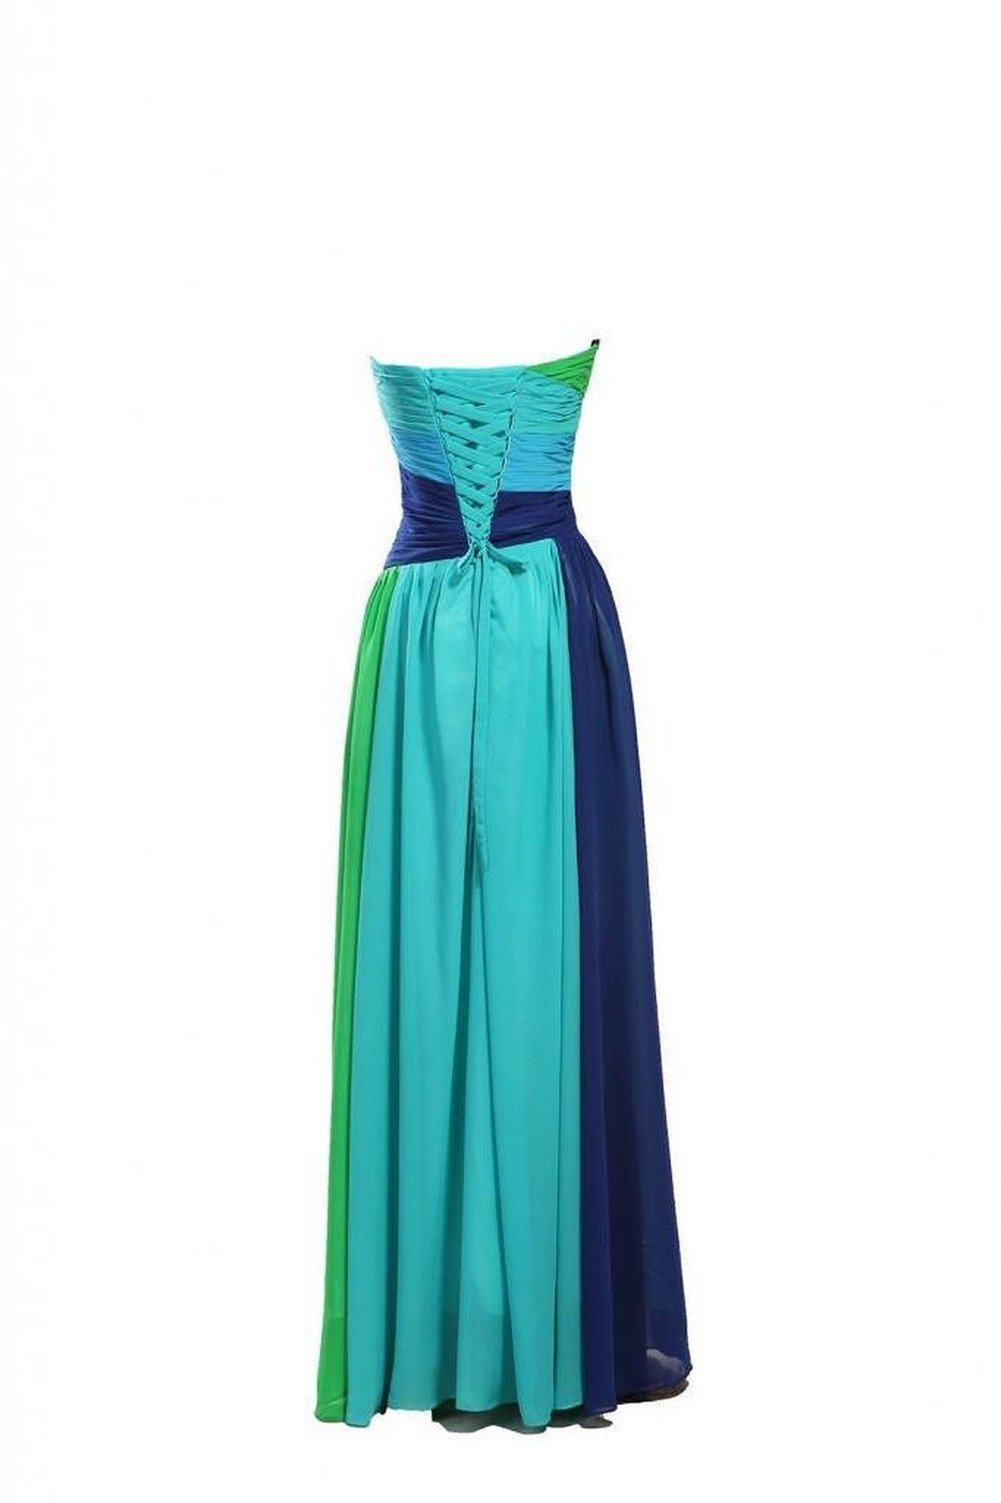 Dormencir Women's Rhinestone Colorful Long Bridesmaid Prom Evening Dresses (12) by Dormencir (Image #2)